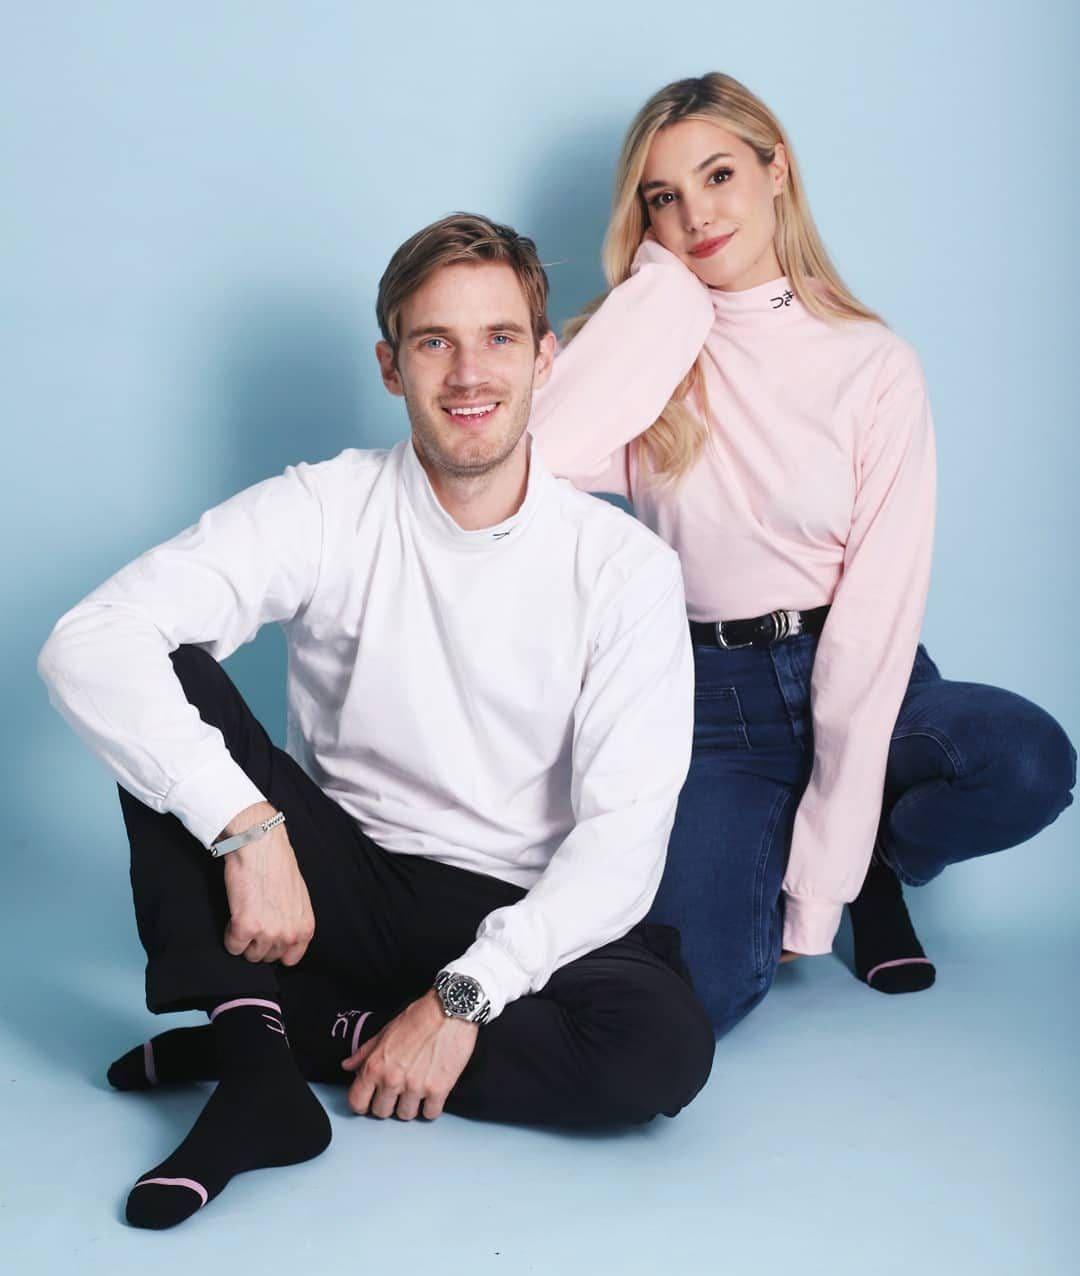 PewDiePie with his wife Marzia Kjellberg